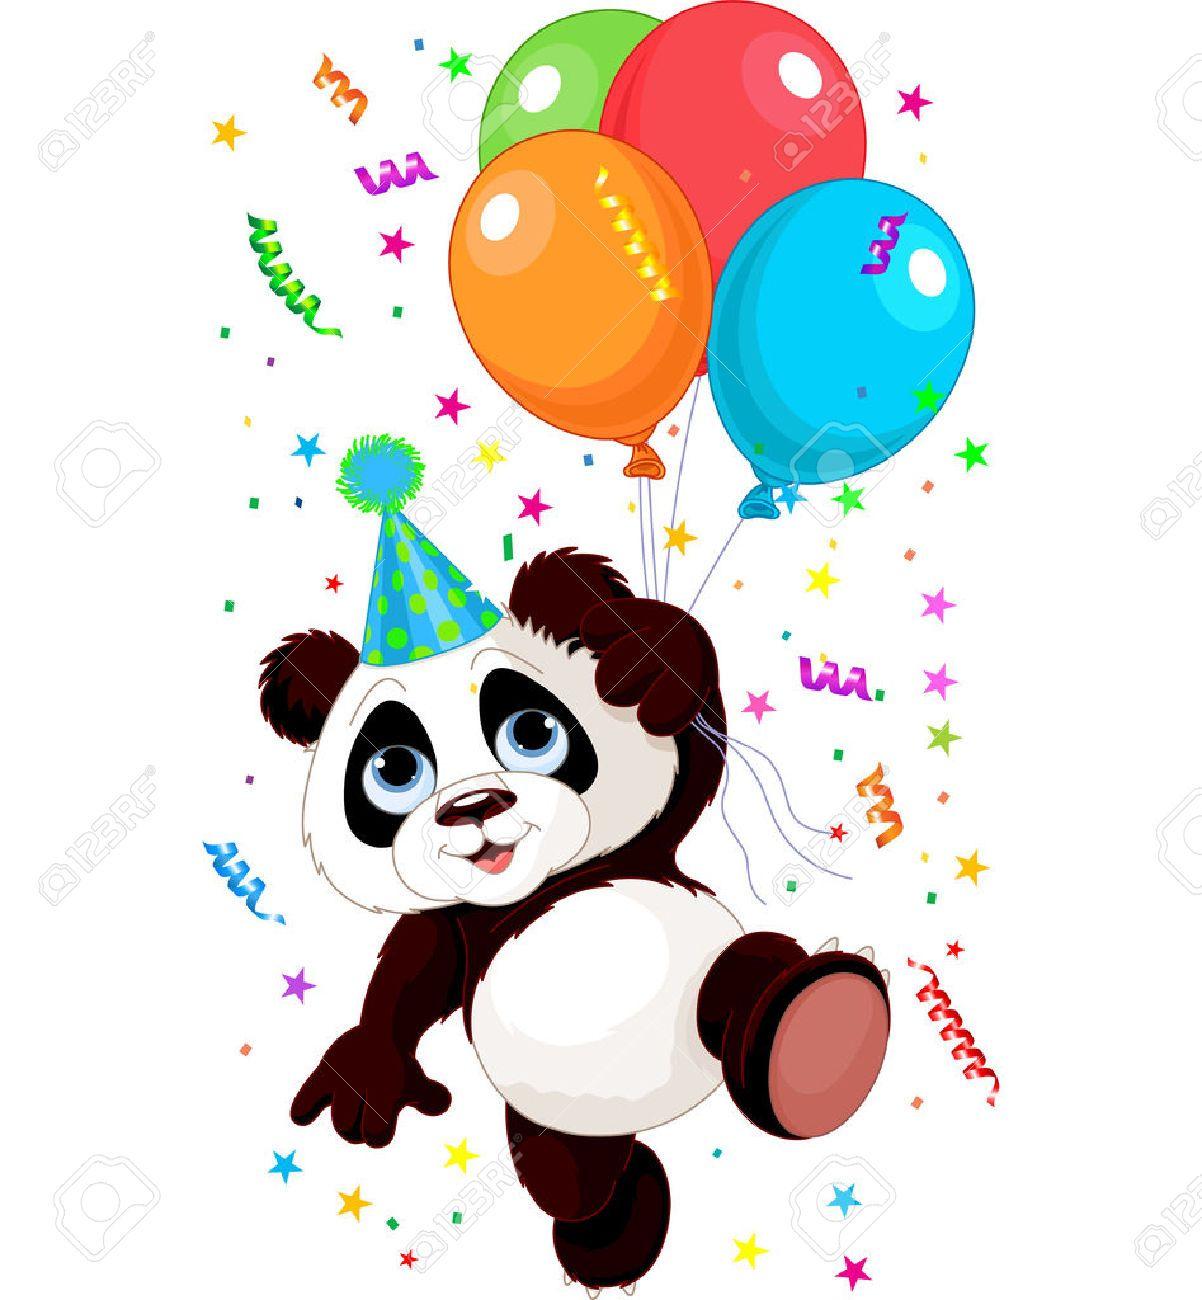 Pin By Olga Ryabyshkina On Animals Pinterest Panda Doodles And